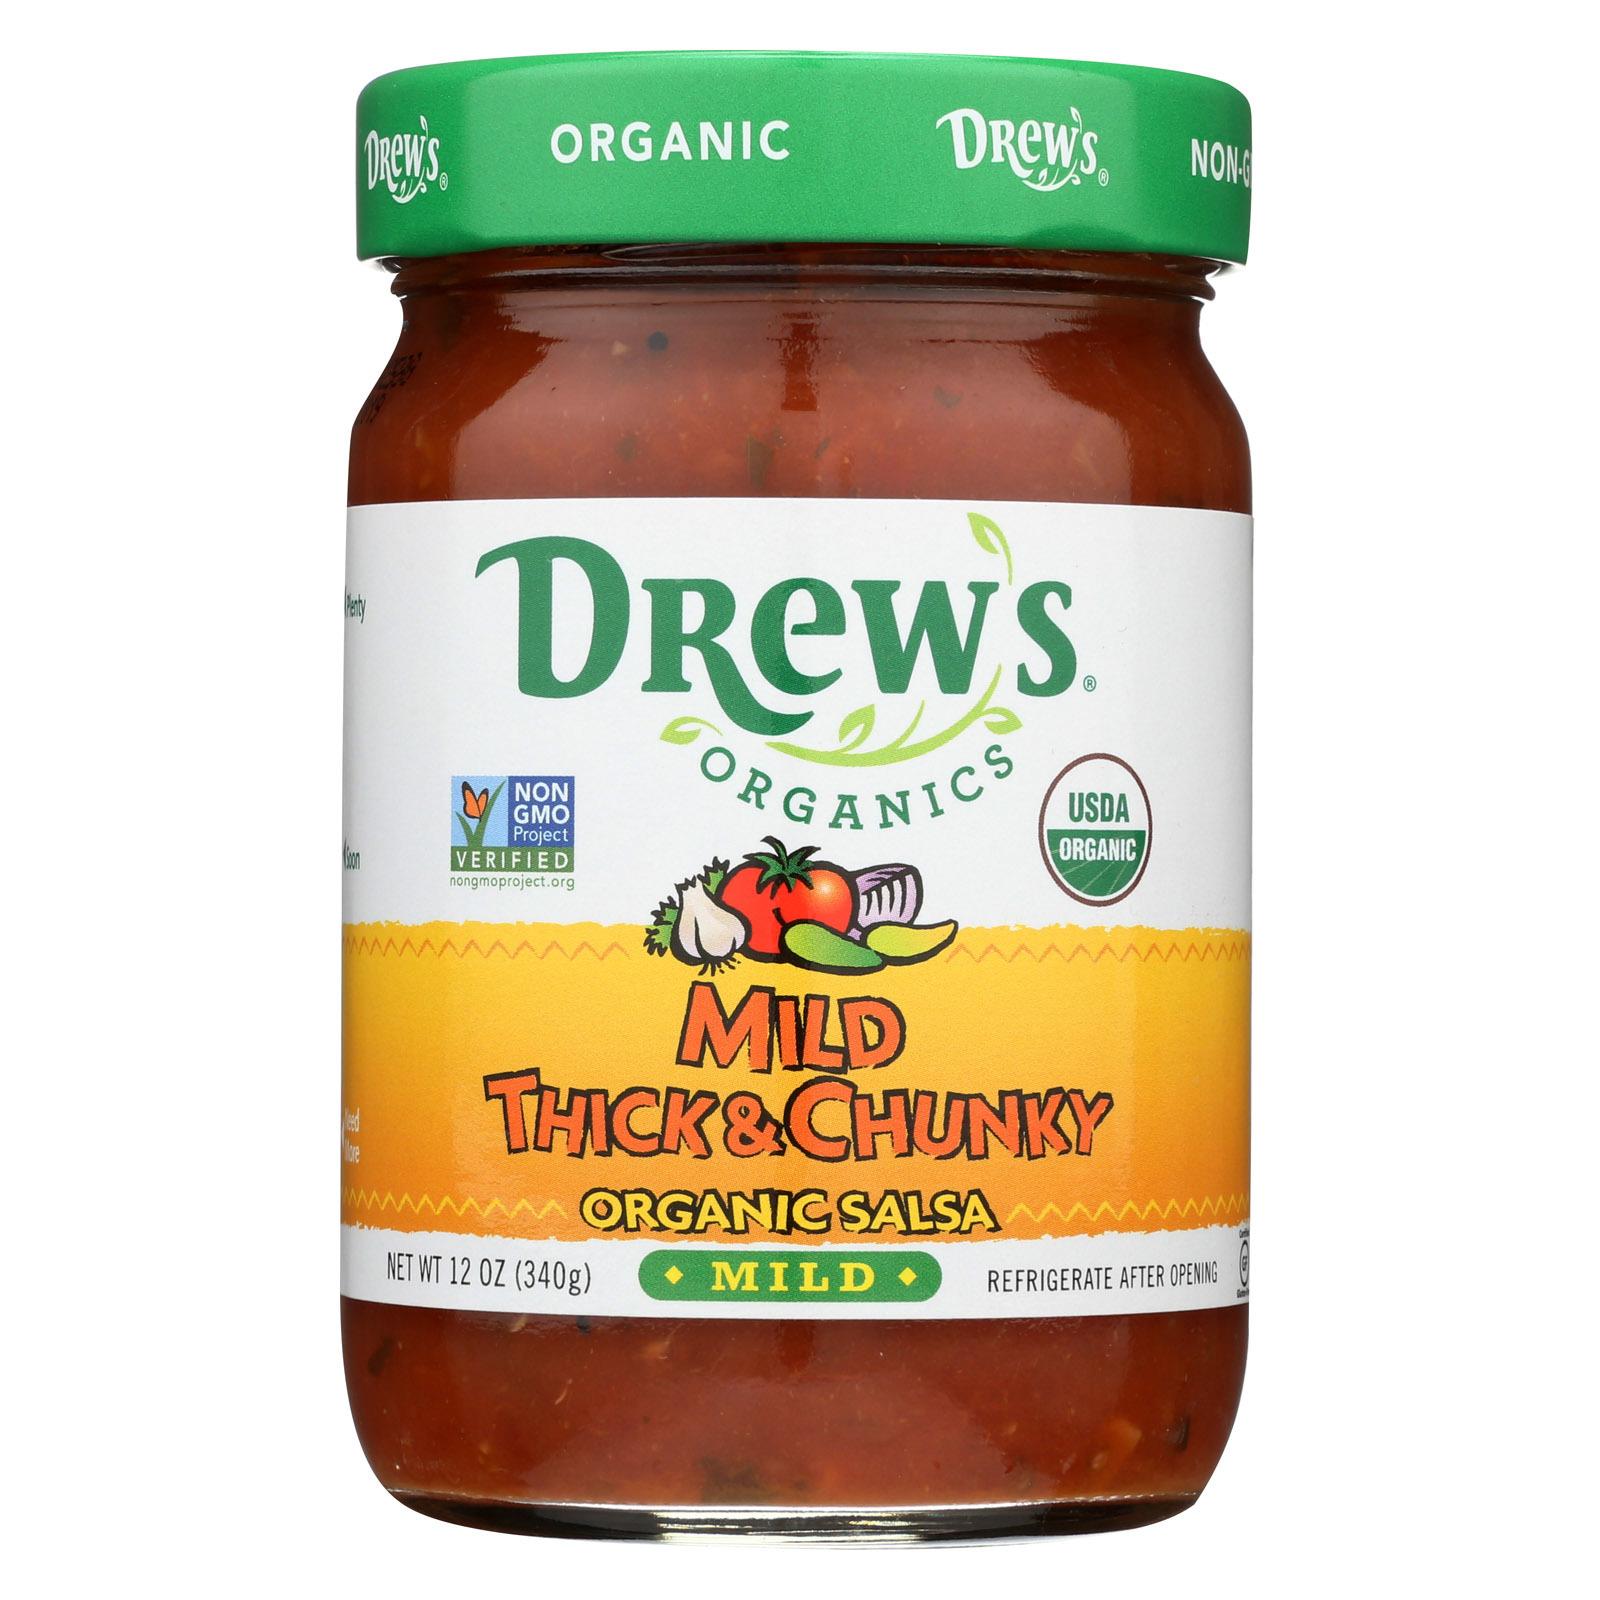 Drew's Organics Mild Thick and Chunky Salsa - 12 Oz. - Case of 6